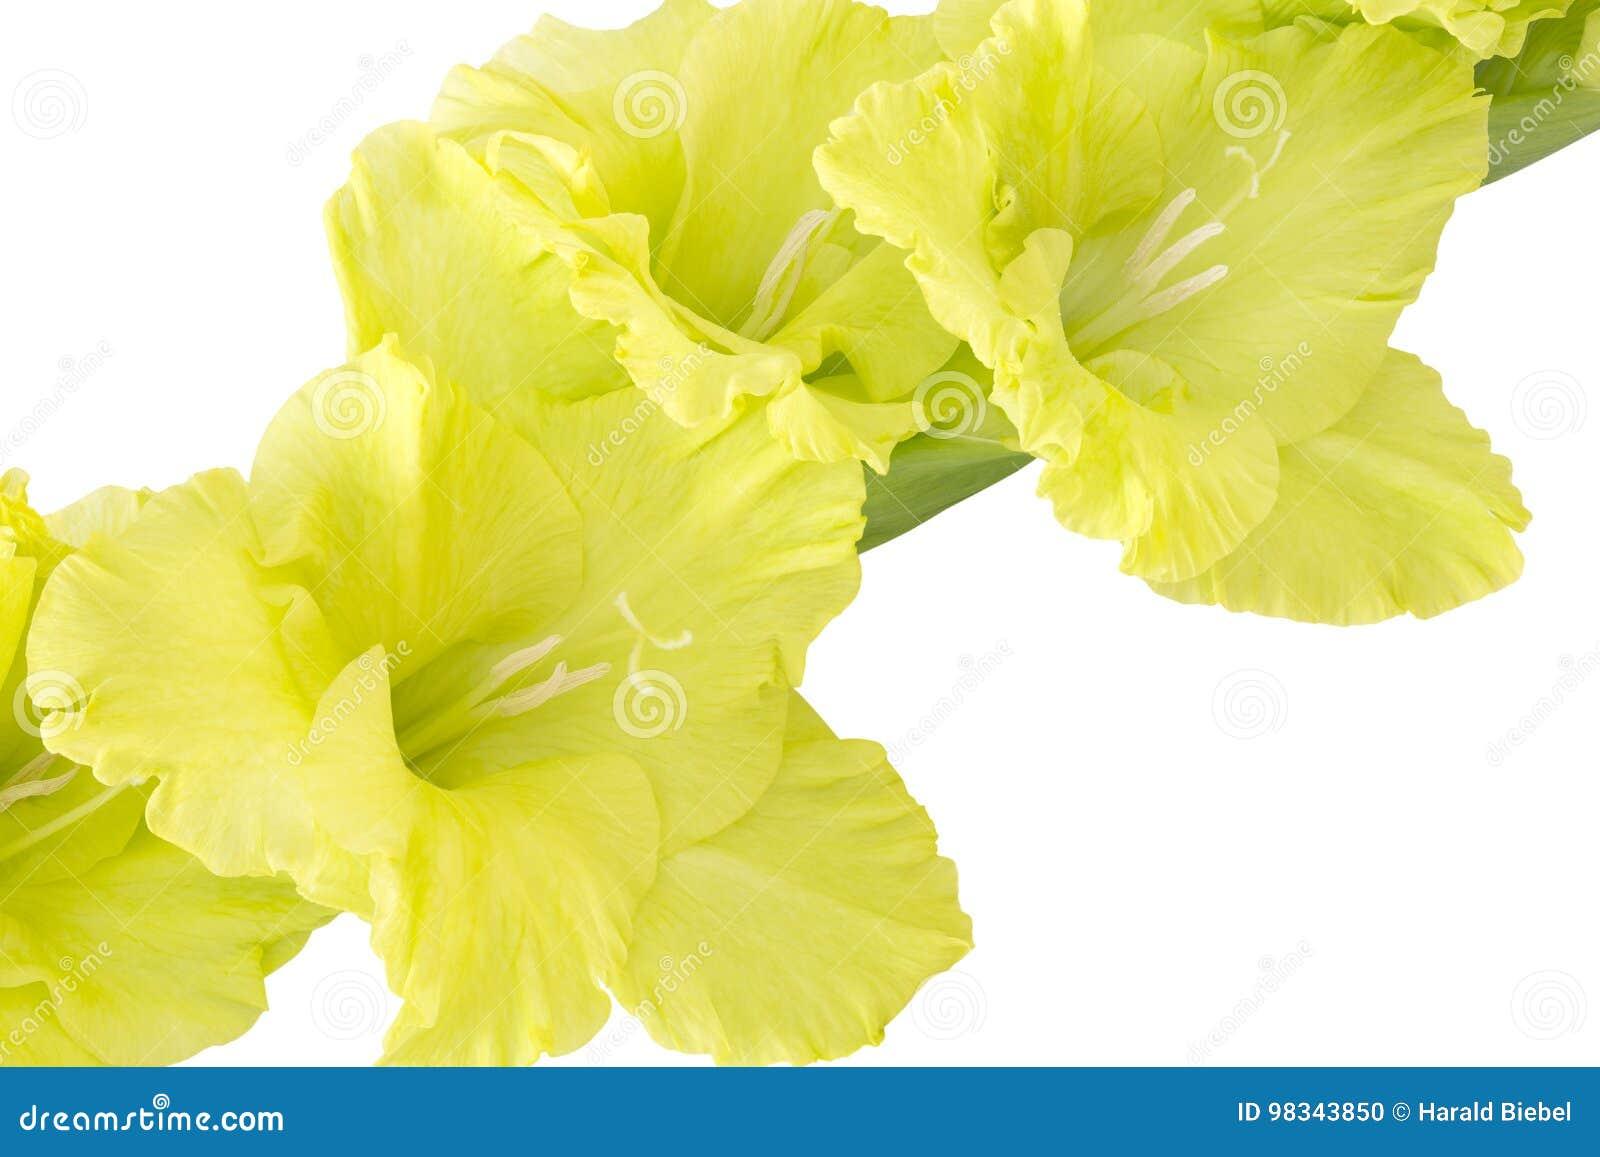 Single gladiolus flower on white stock photo image of card pastel download single gladiolus flower on white stock photo image of card pastel 98343850 mightylinksfo